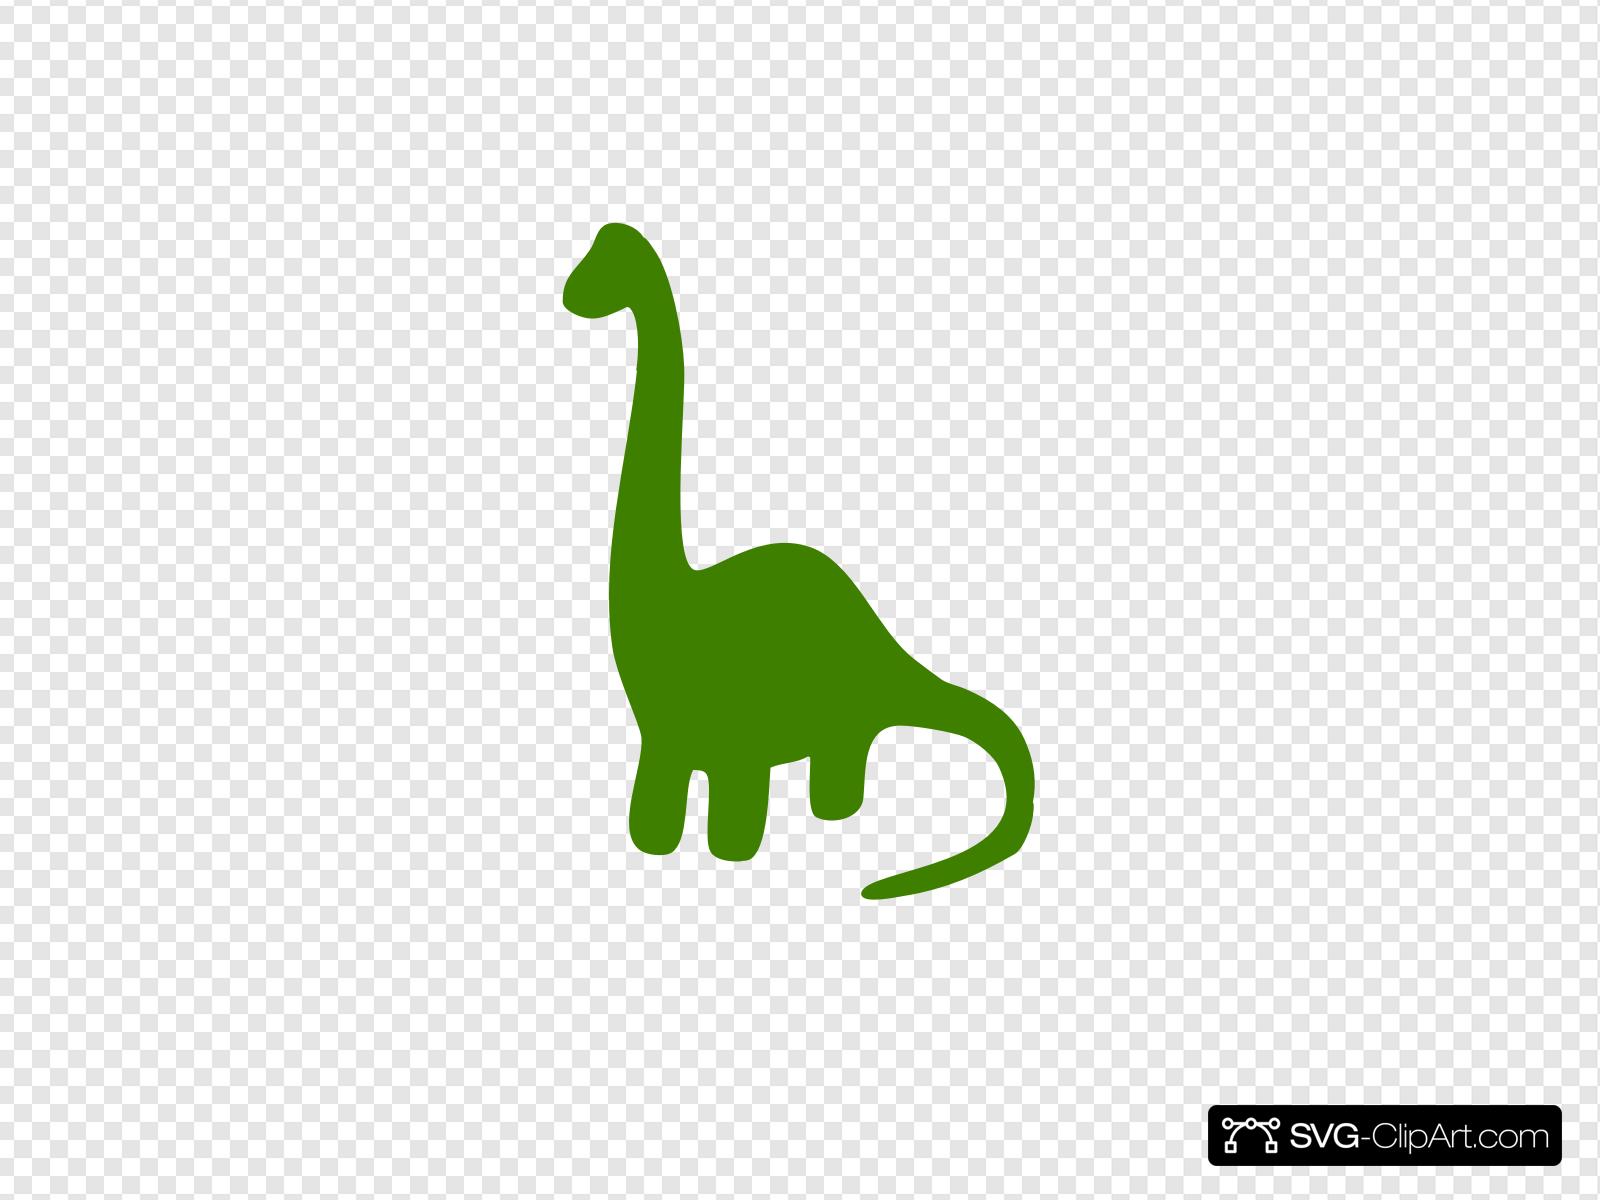 Green Bronto Clip art, Icon and SVG.